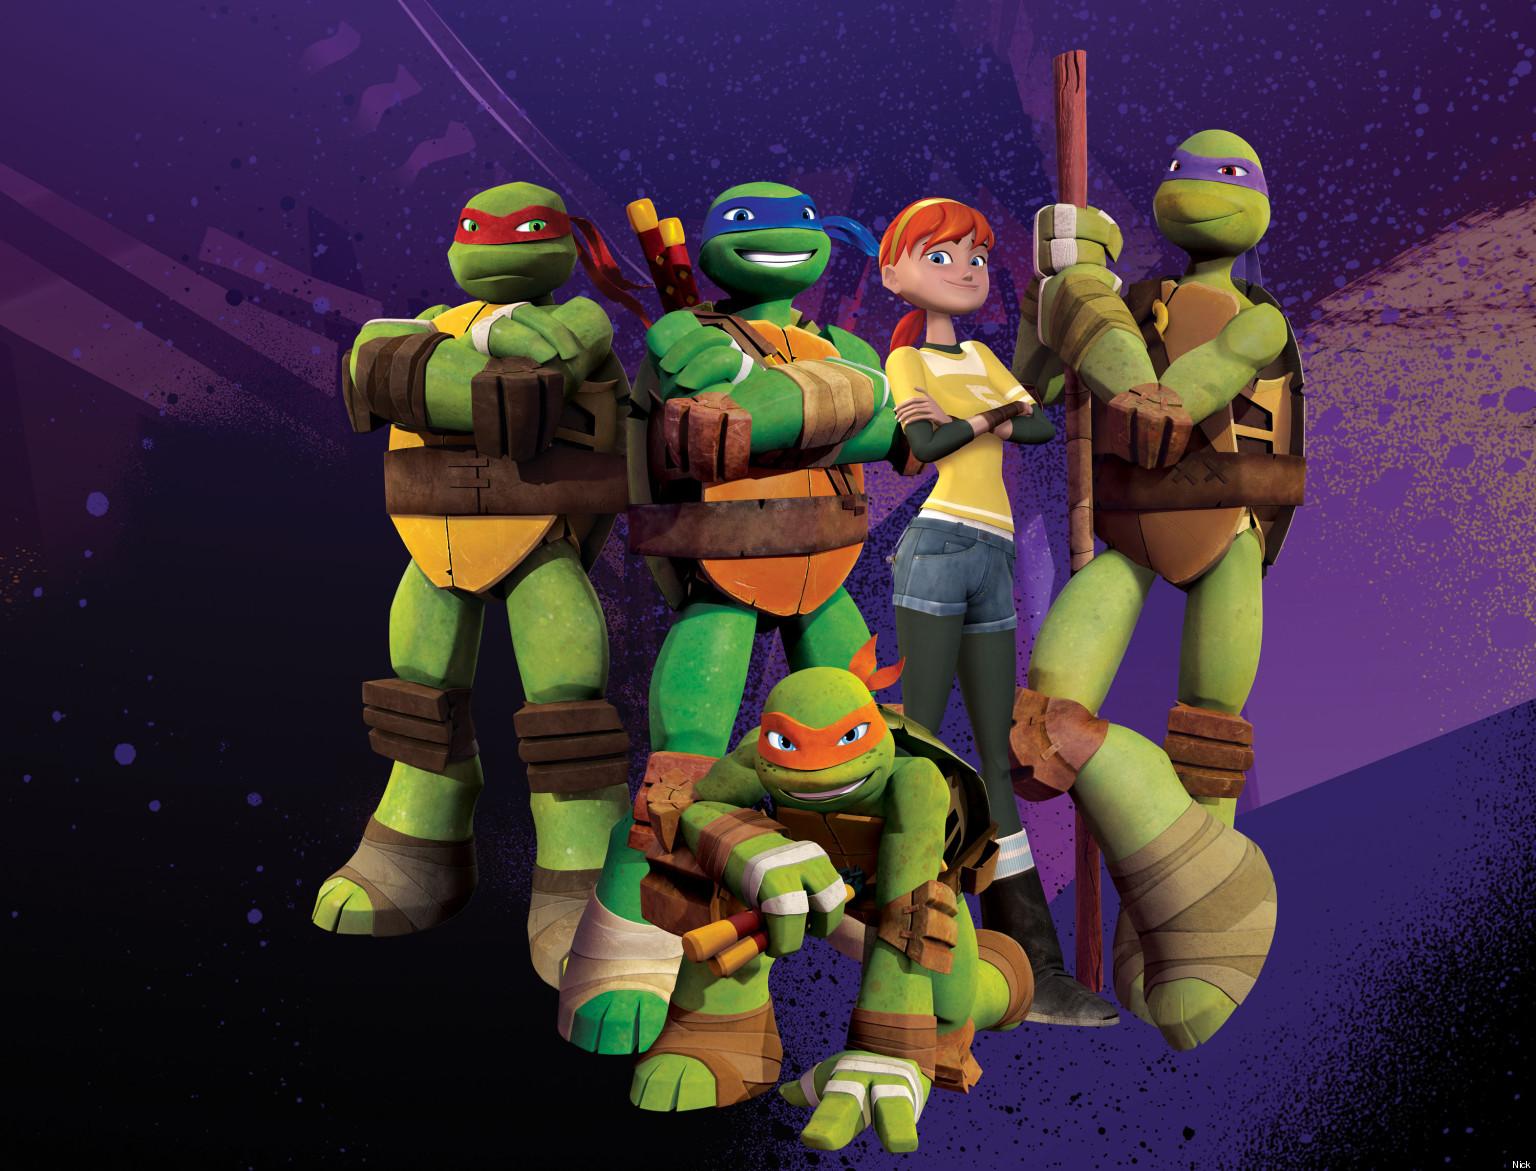 teenage mutant ninja turtles is back bigger than ever huffpost